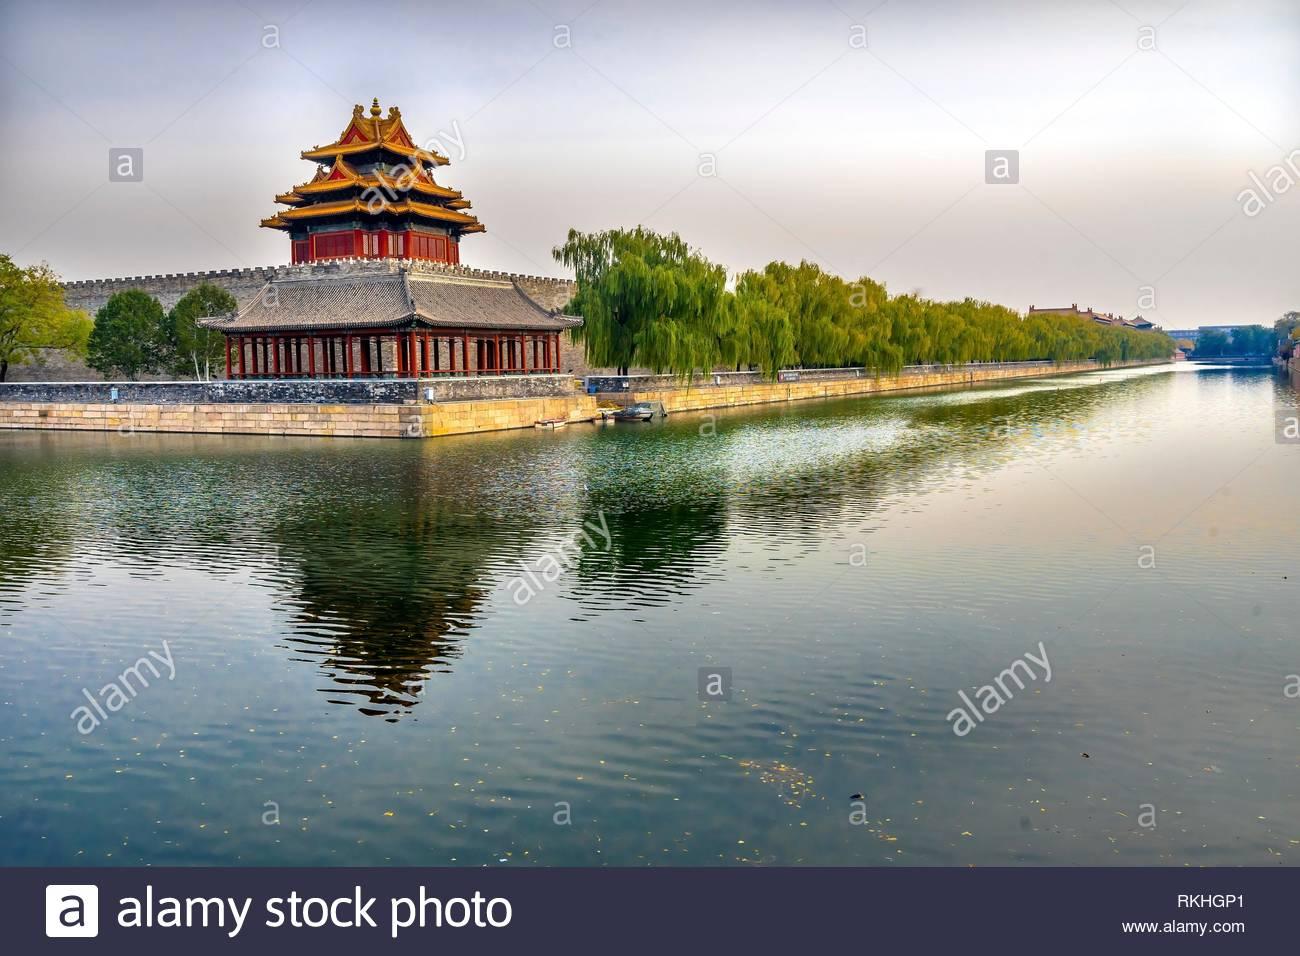 Pfeil Watch Tower Gugong Verbotene Stadt Graben Canal Plaace Wand Beijing China. Der Kaiserpalast in den 1600er Jahren in der Ming Dynastie errichtet. Stockbild